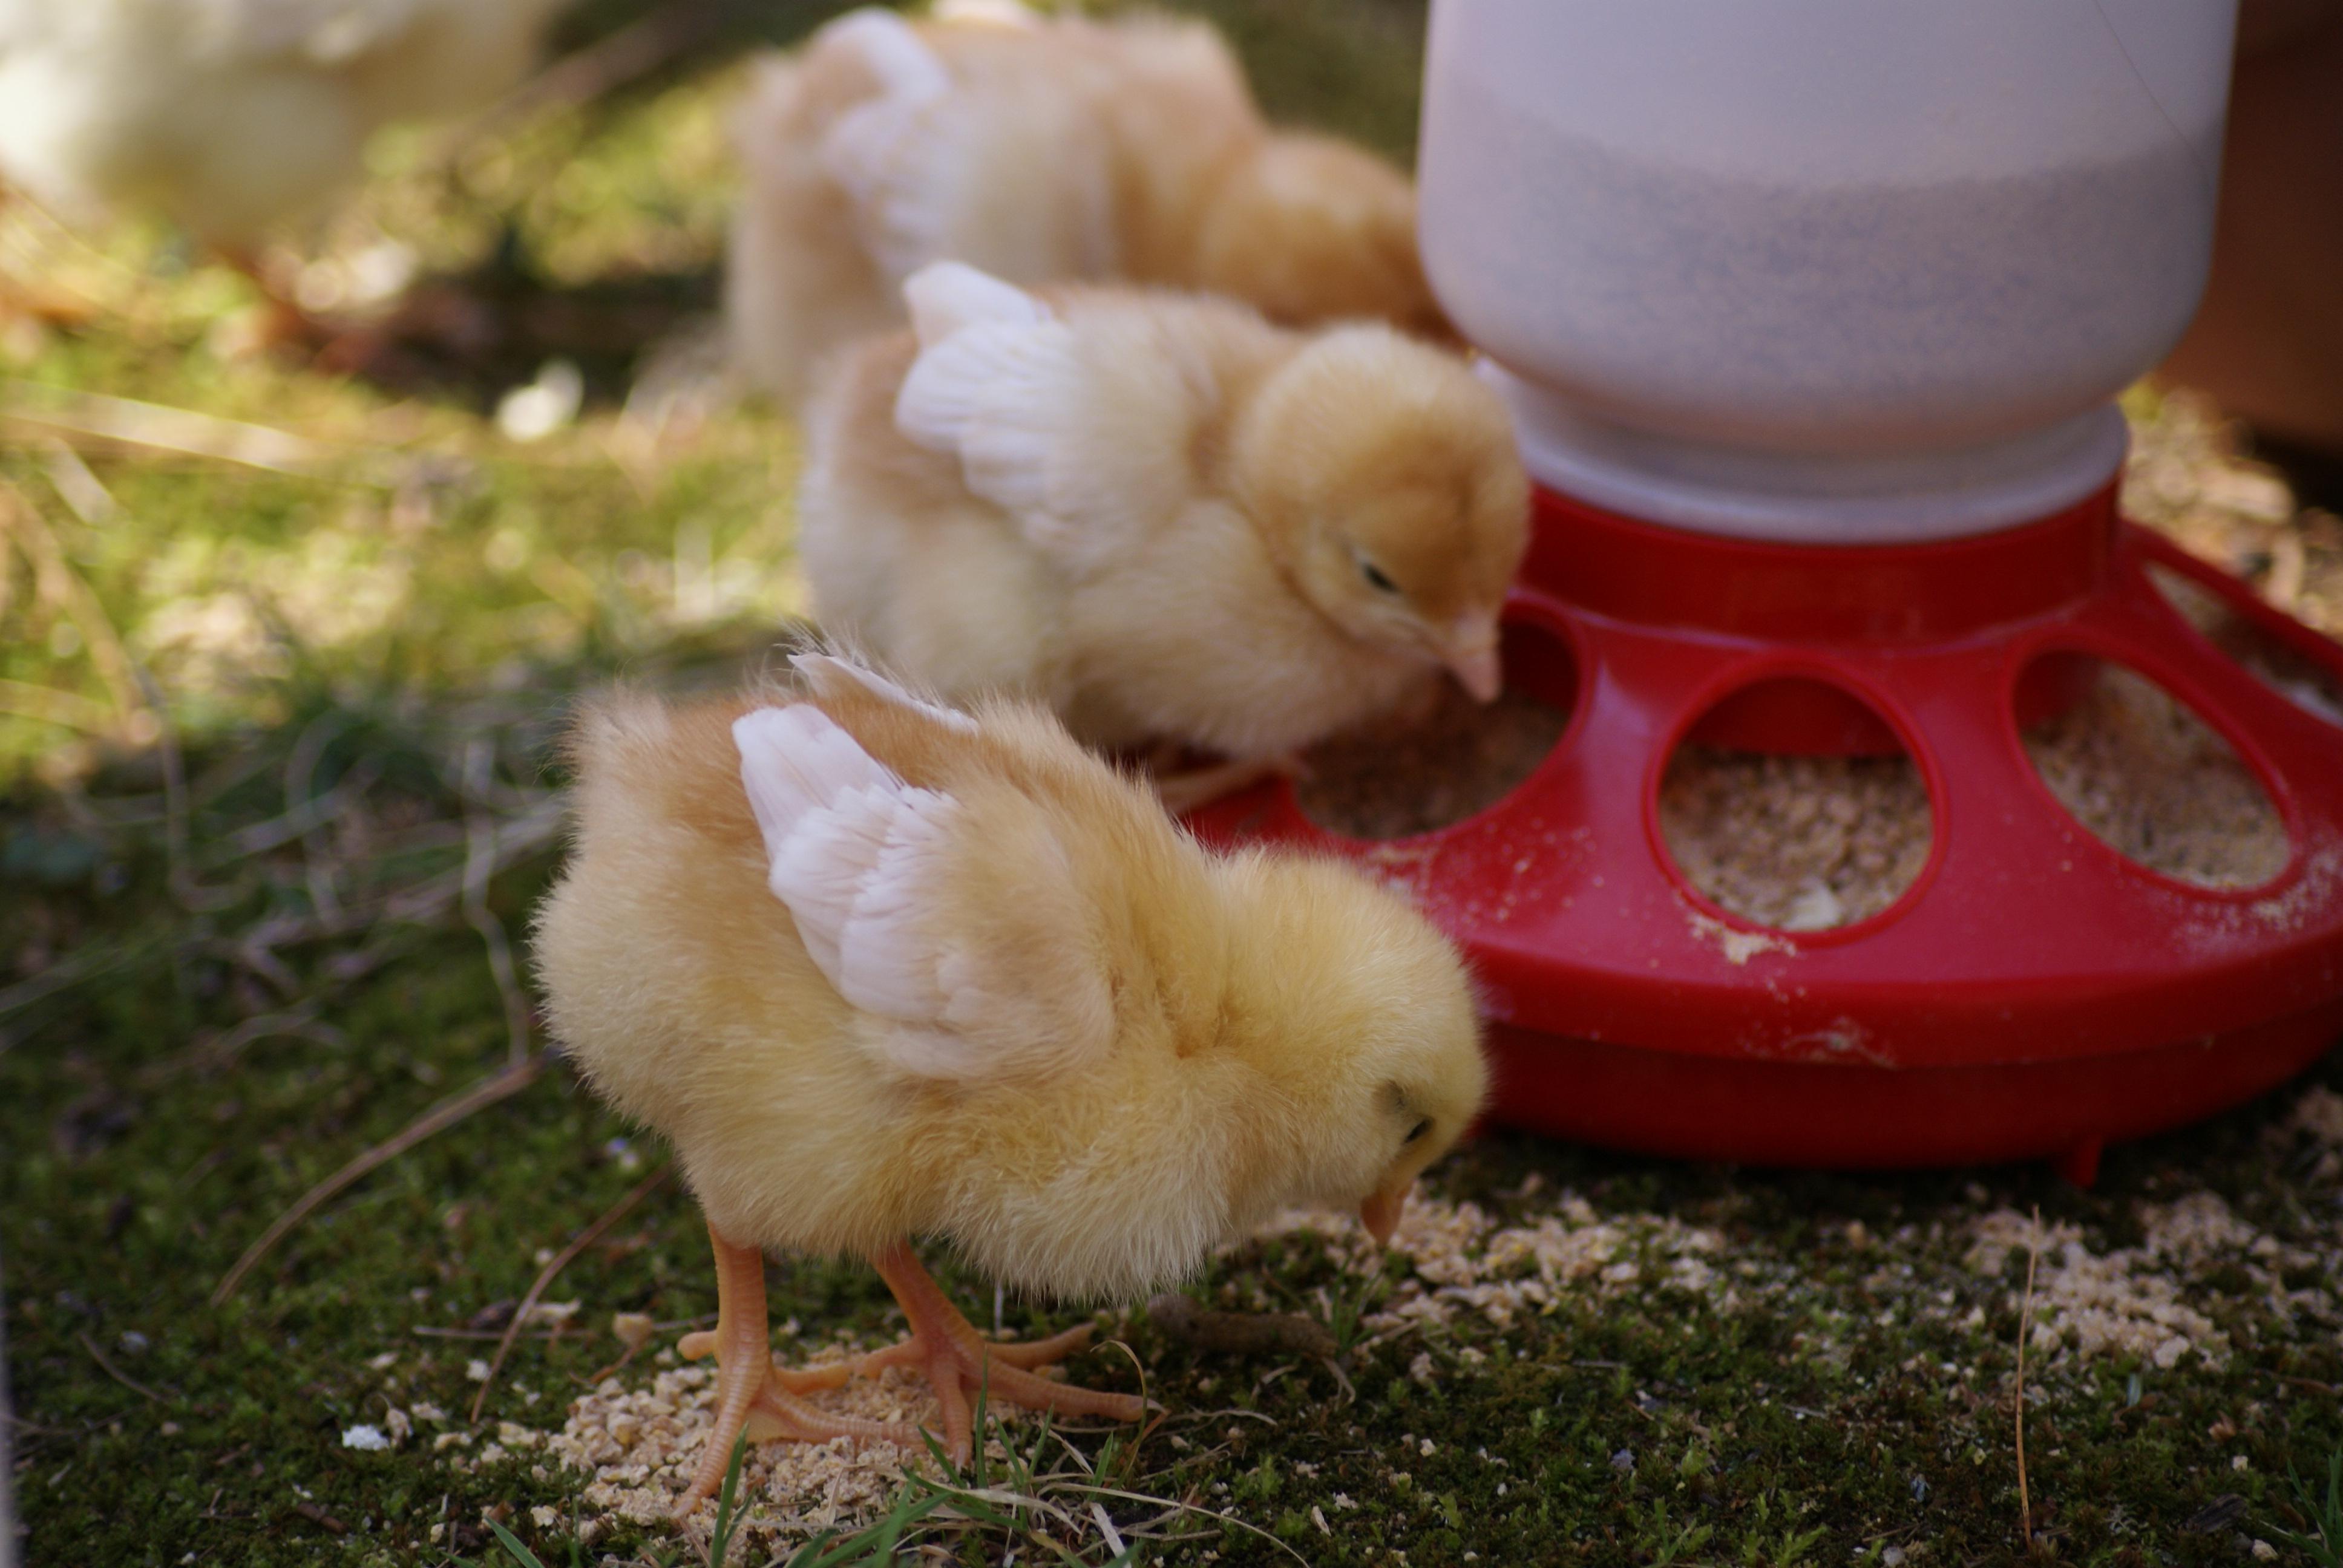 желаю, картинки зерен для цыплят расположен